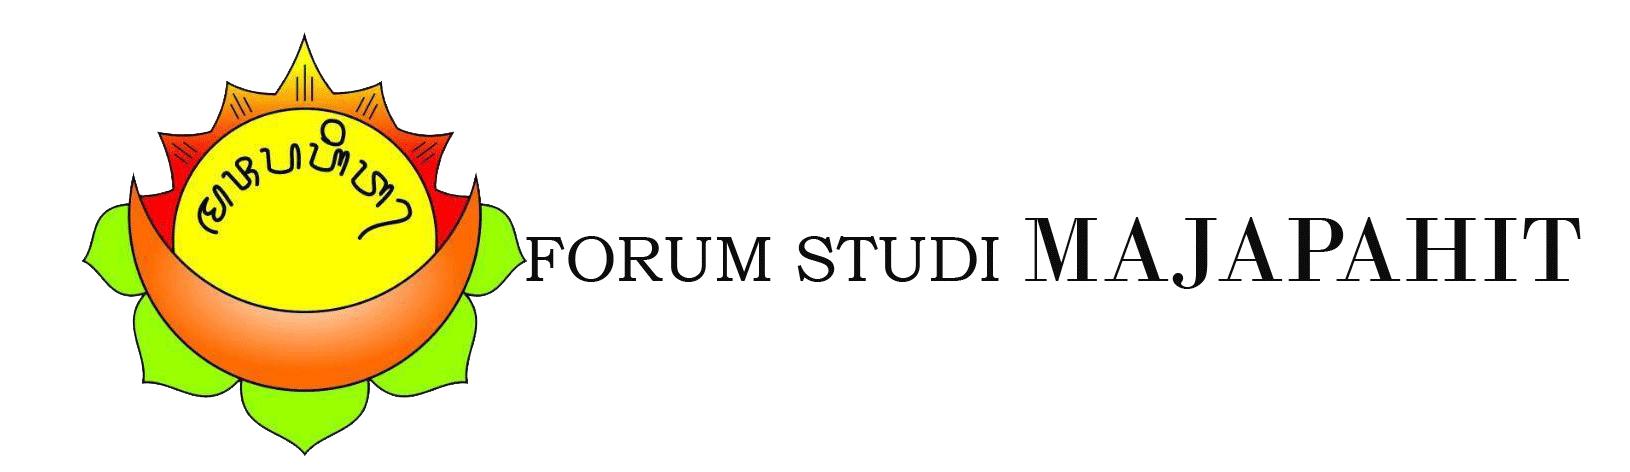 Forum Studi Majapahit